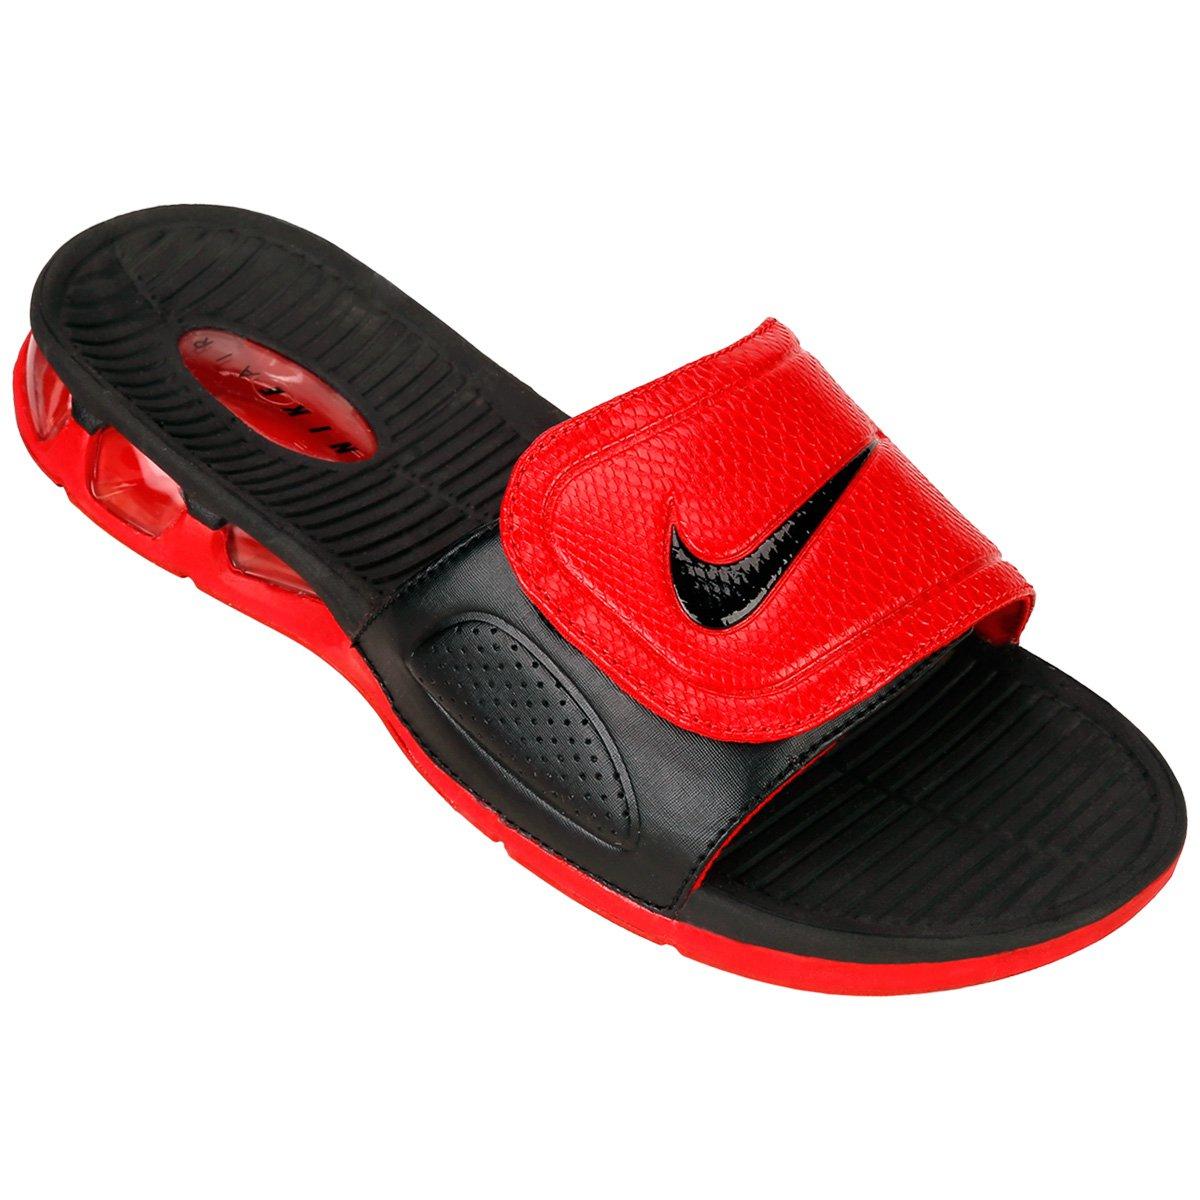 ed22f71137d Sandália Nike Air Experience Slide - Compre Agora